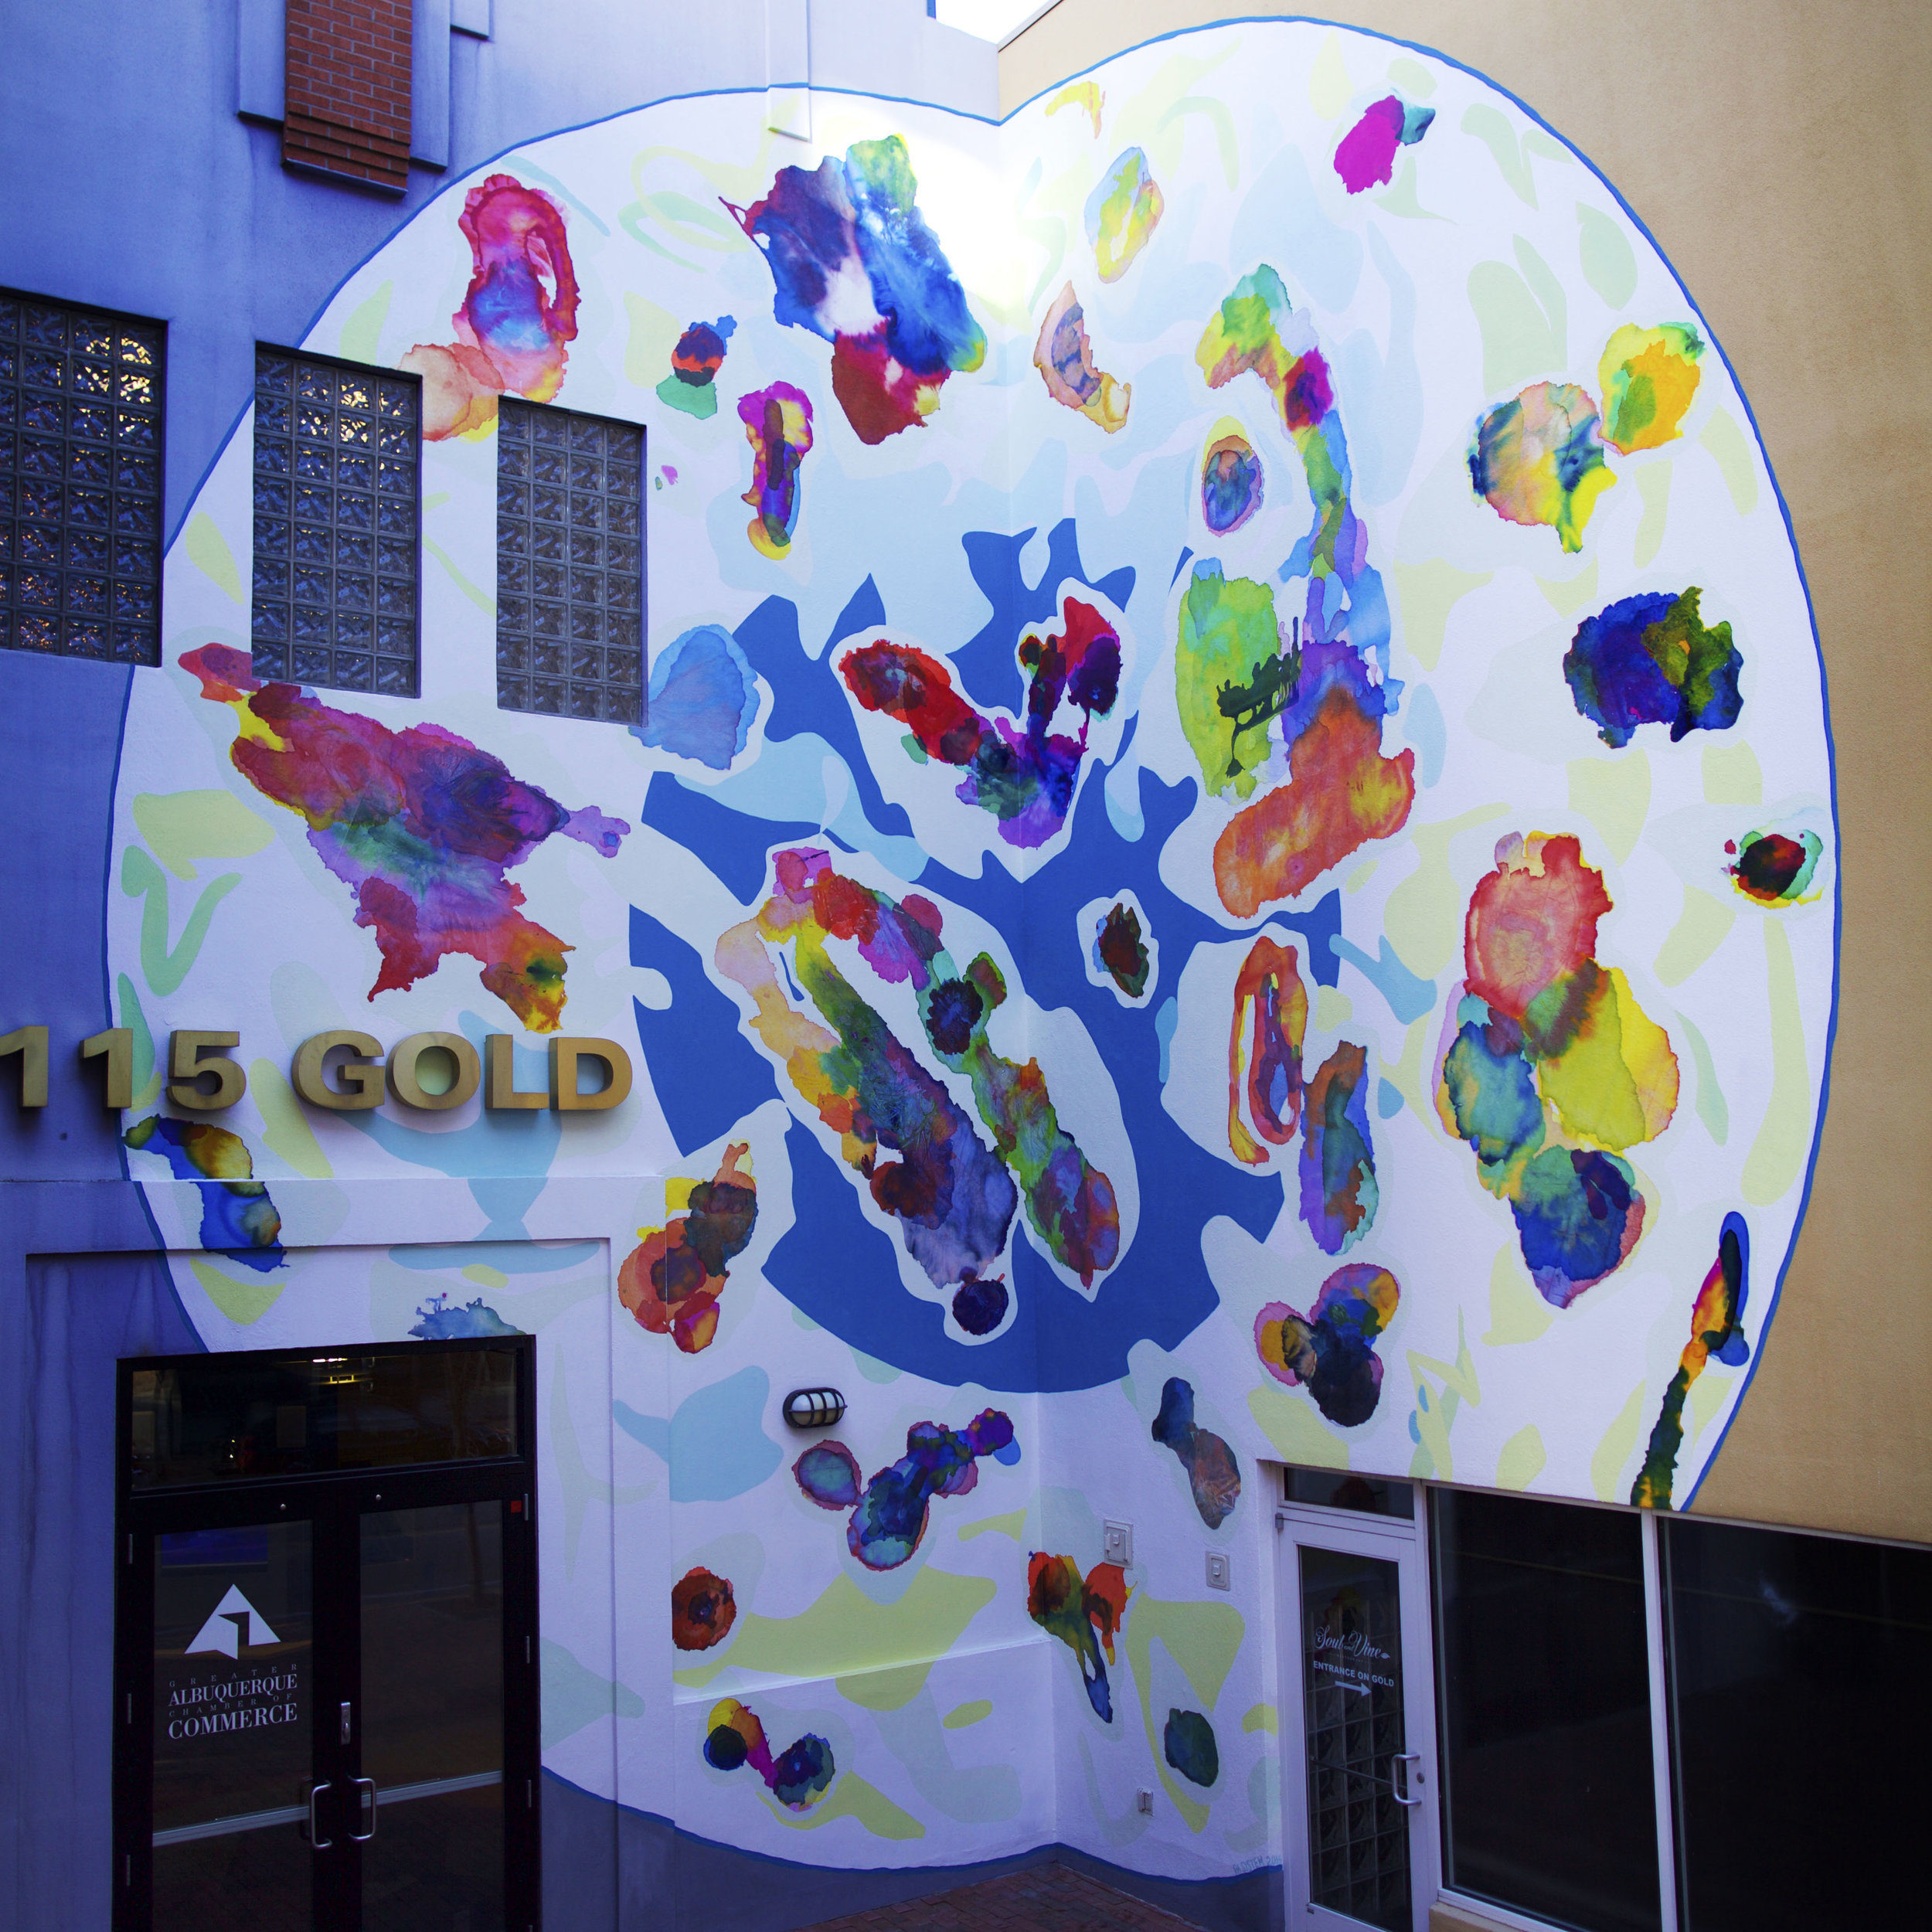 Colour Sphere, Albuquerque Public Art and 516 Arts, 2016